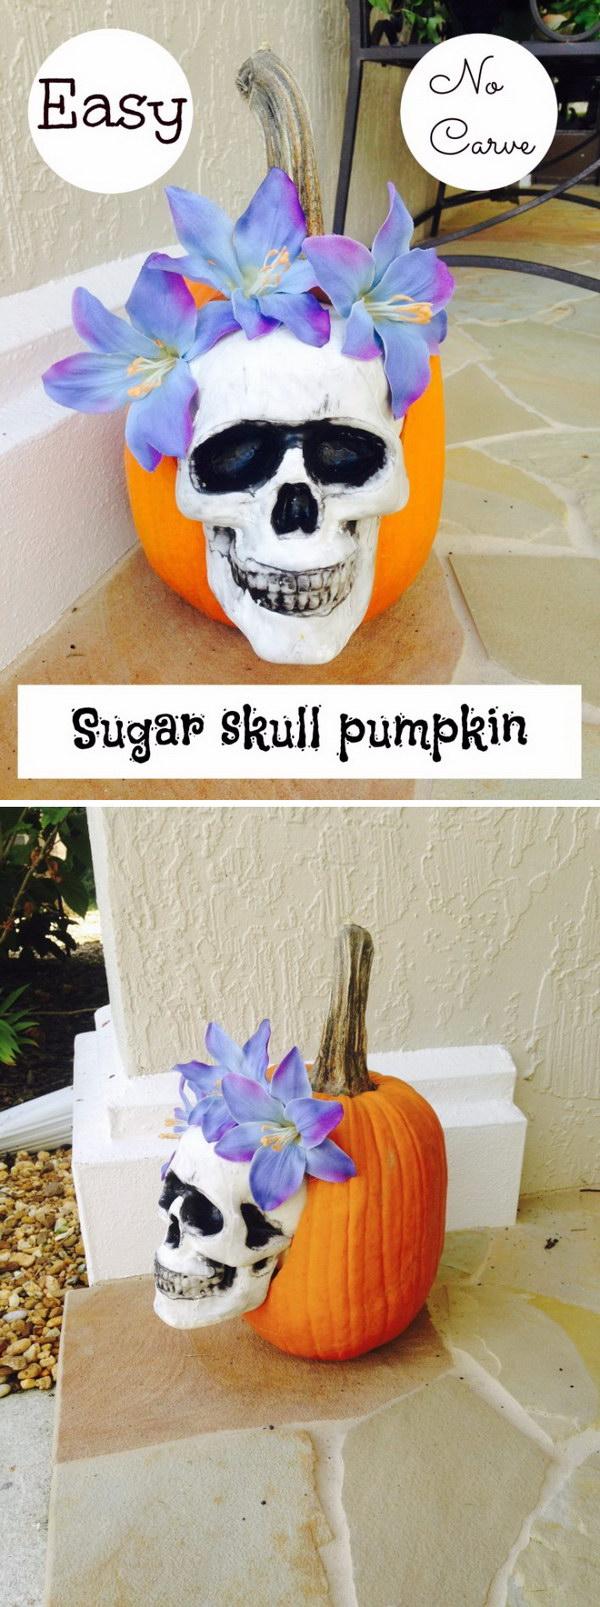 Easy No Carve Sugar Skull  Pumpkin Decorating.